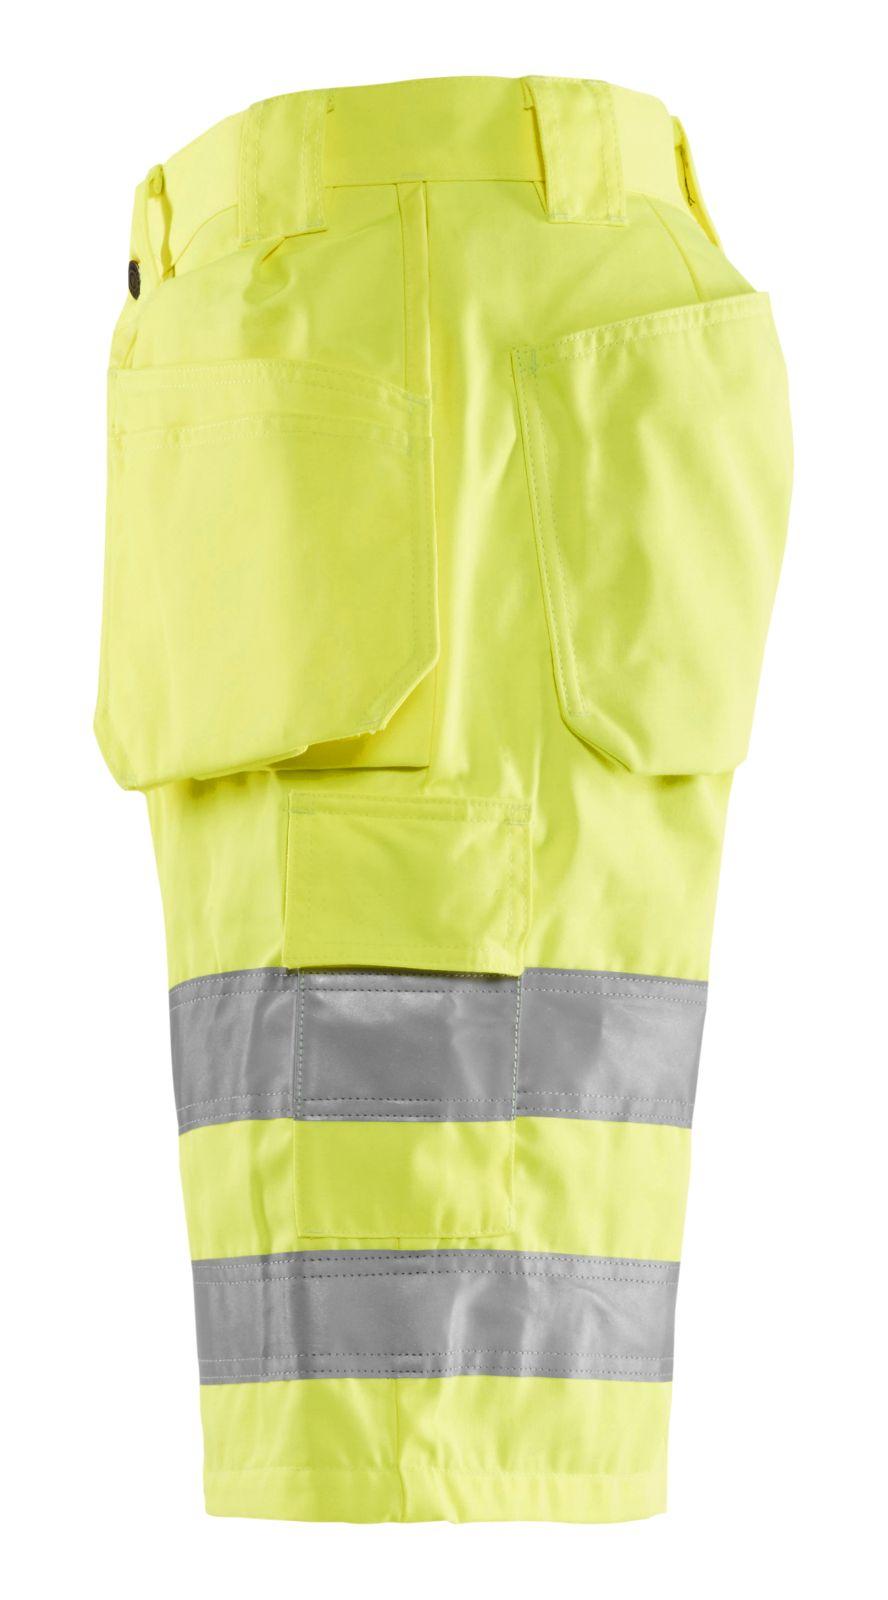 Blaklader Korte werkbroeken 15351804 High Vis fluo-geel(3300)